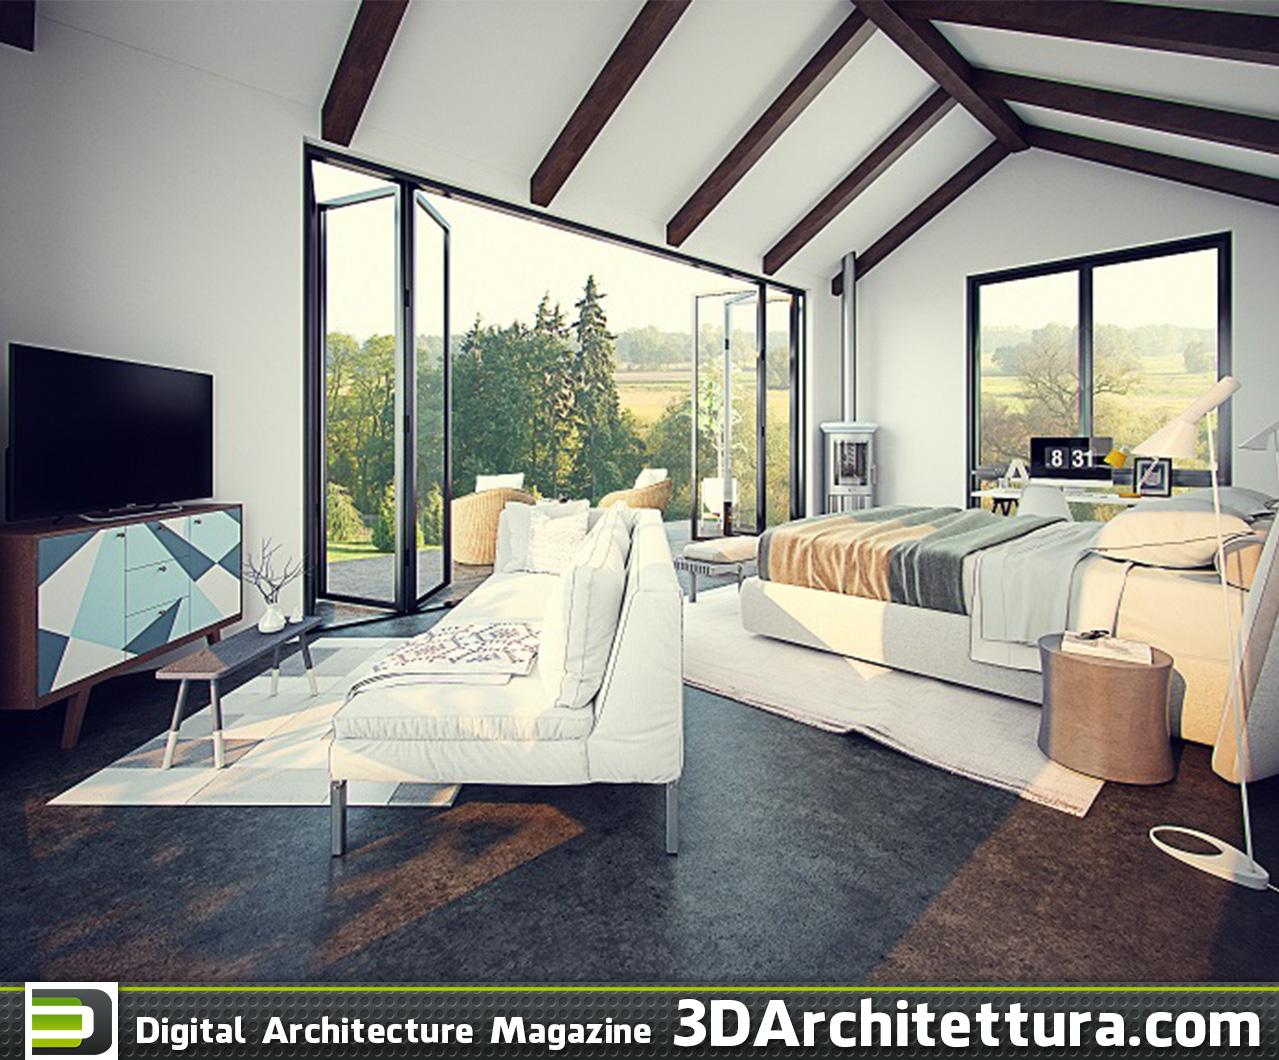 Id studio 3d architettura digital architecture magazine for Software architettura 3d